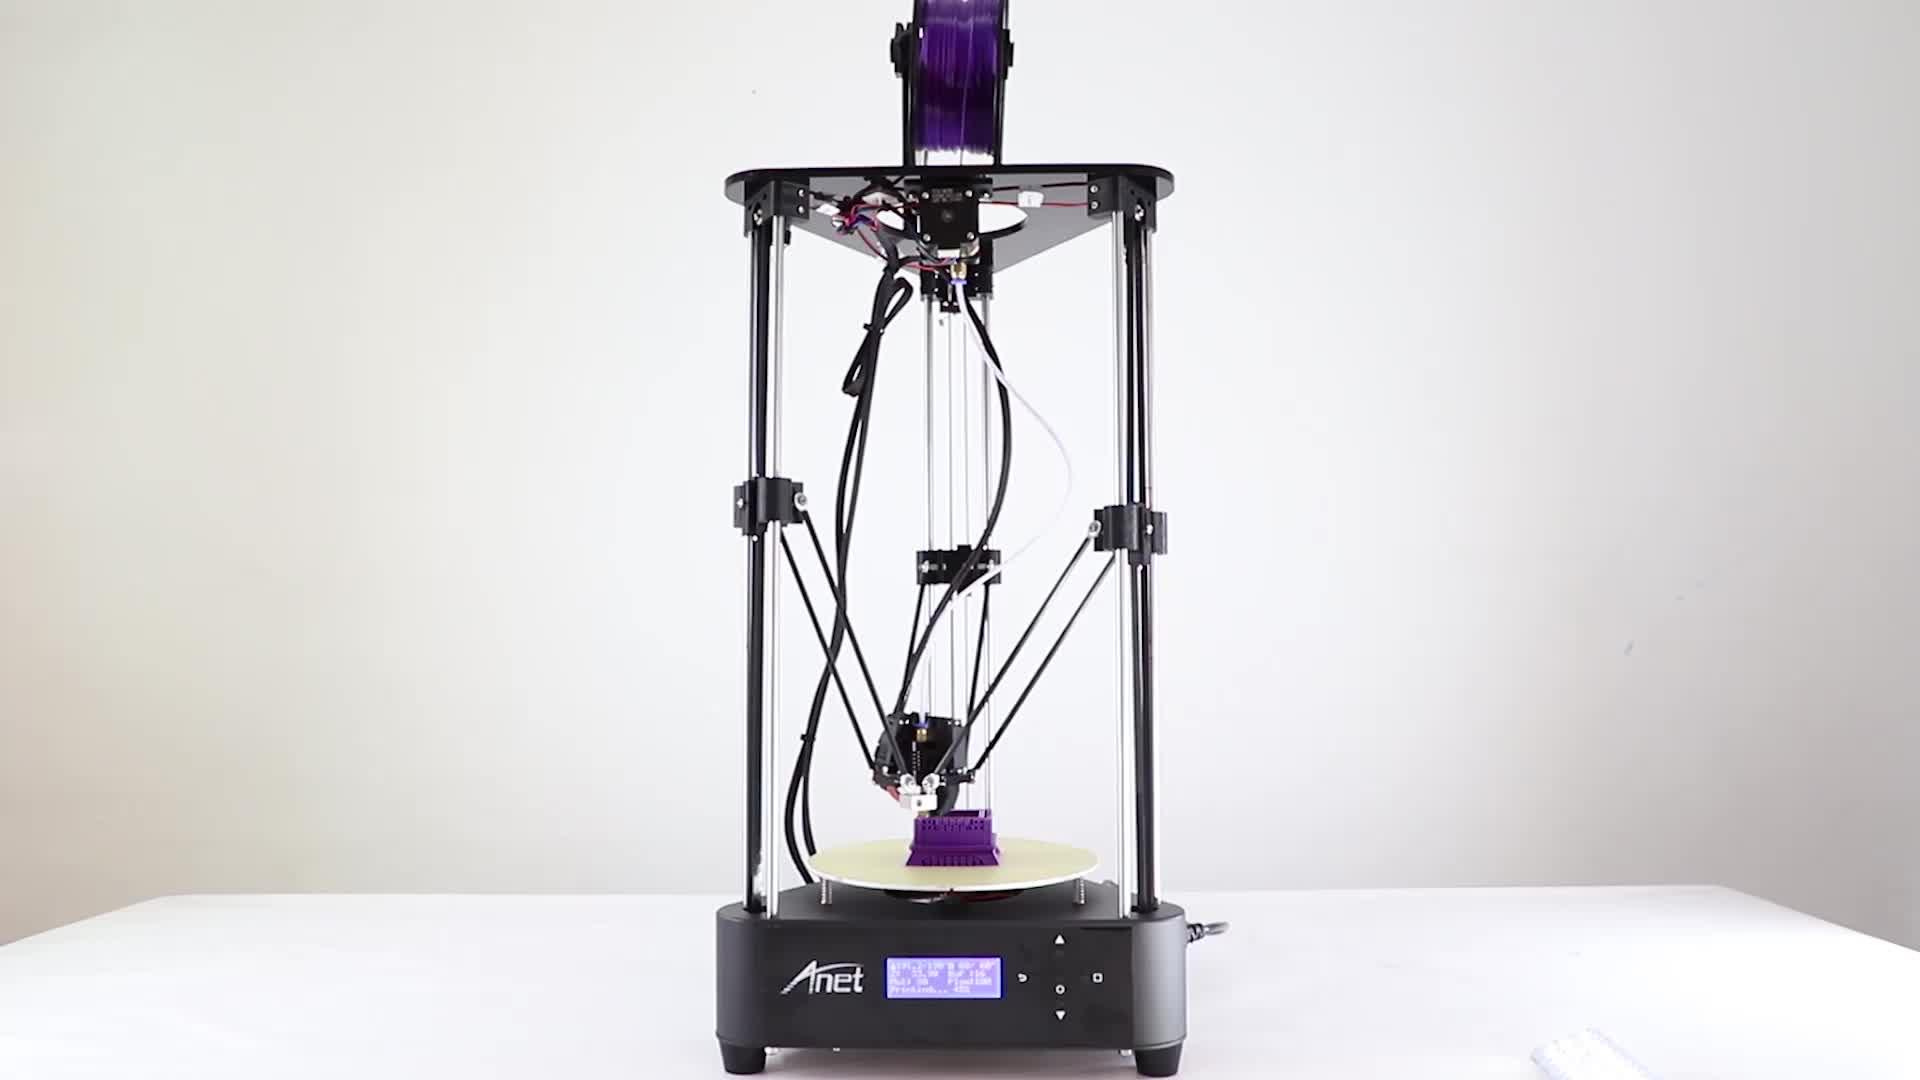 Hoge kwaliteit impresora 3d bouwmachines 3d printer te koop